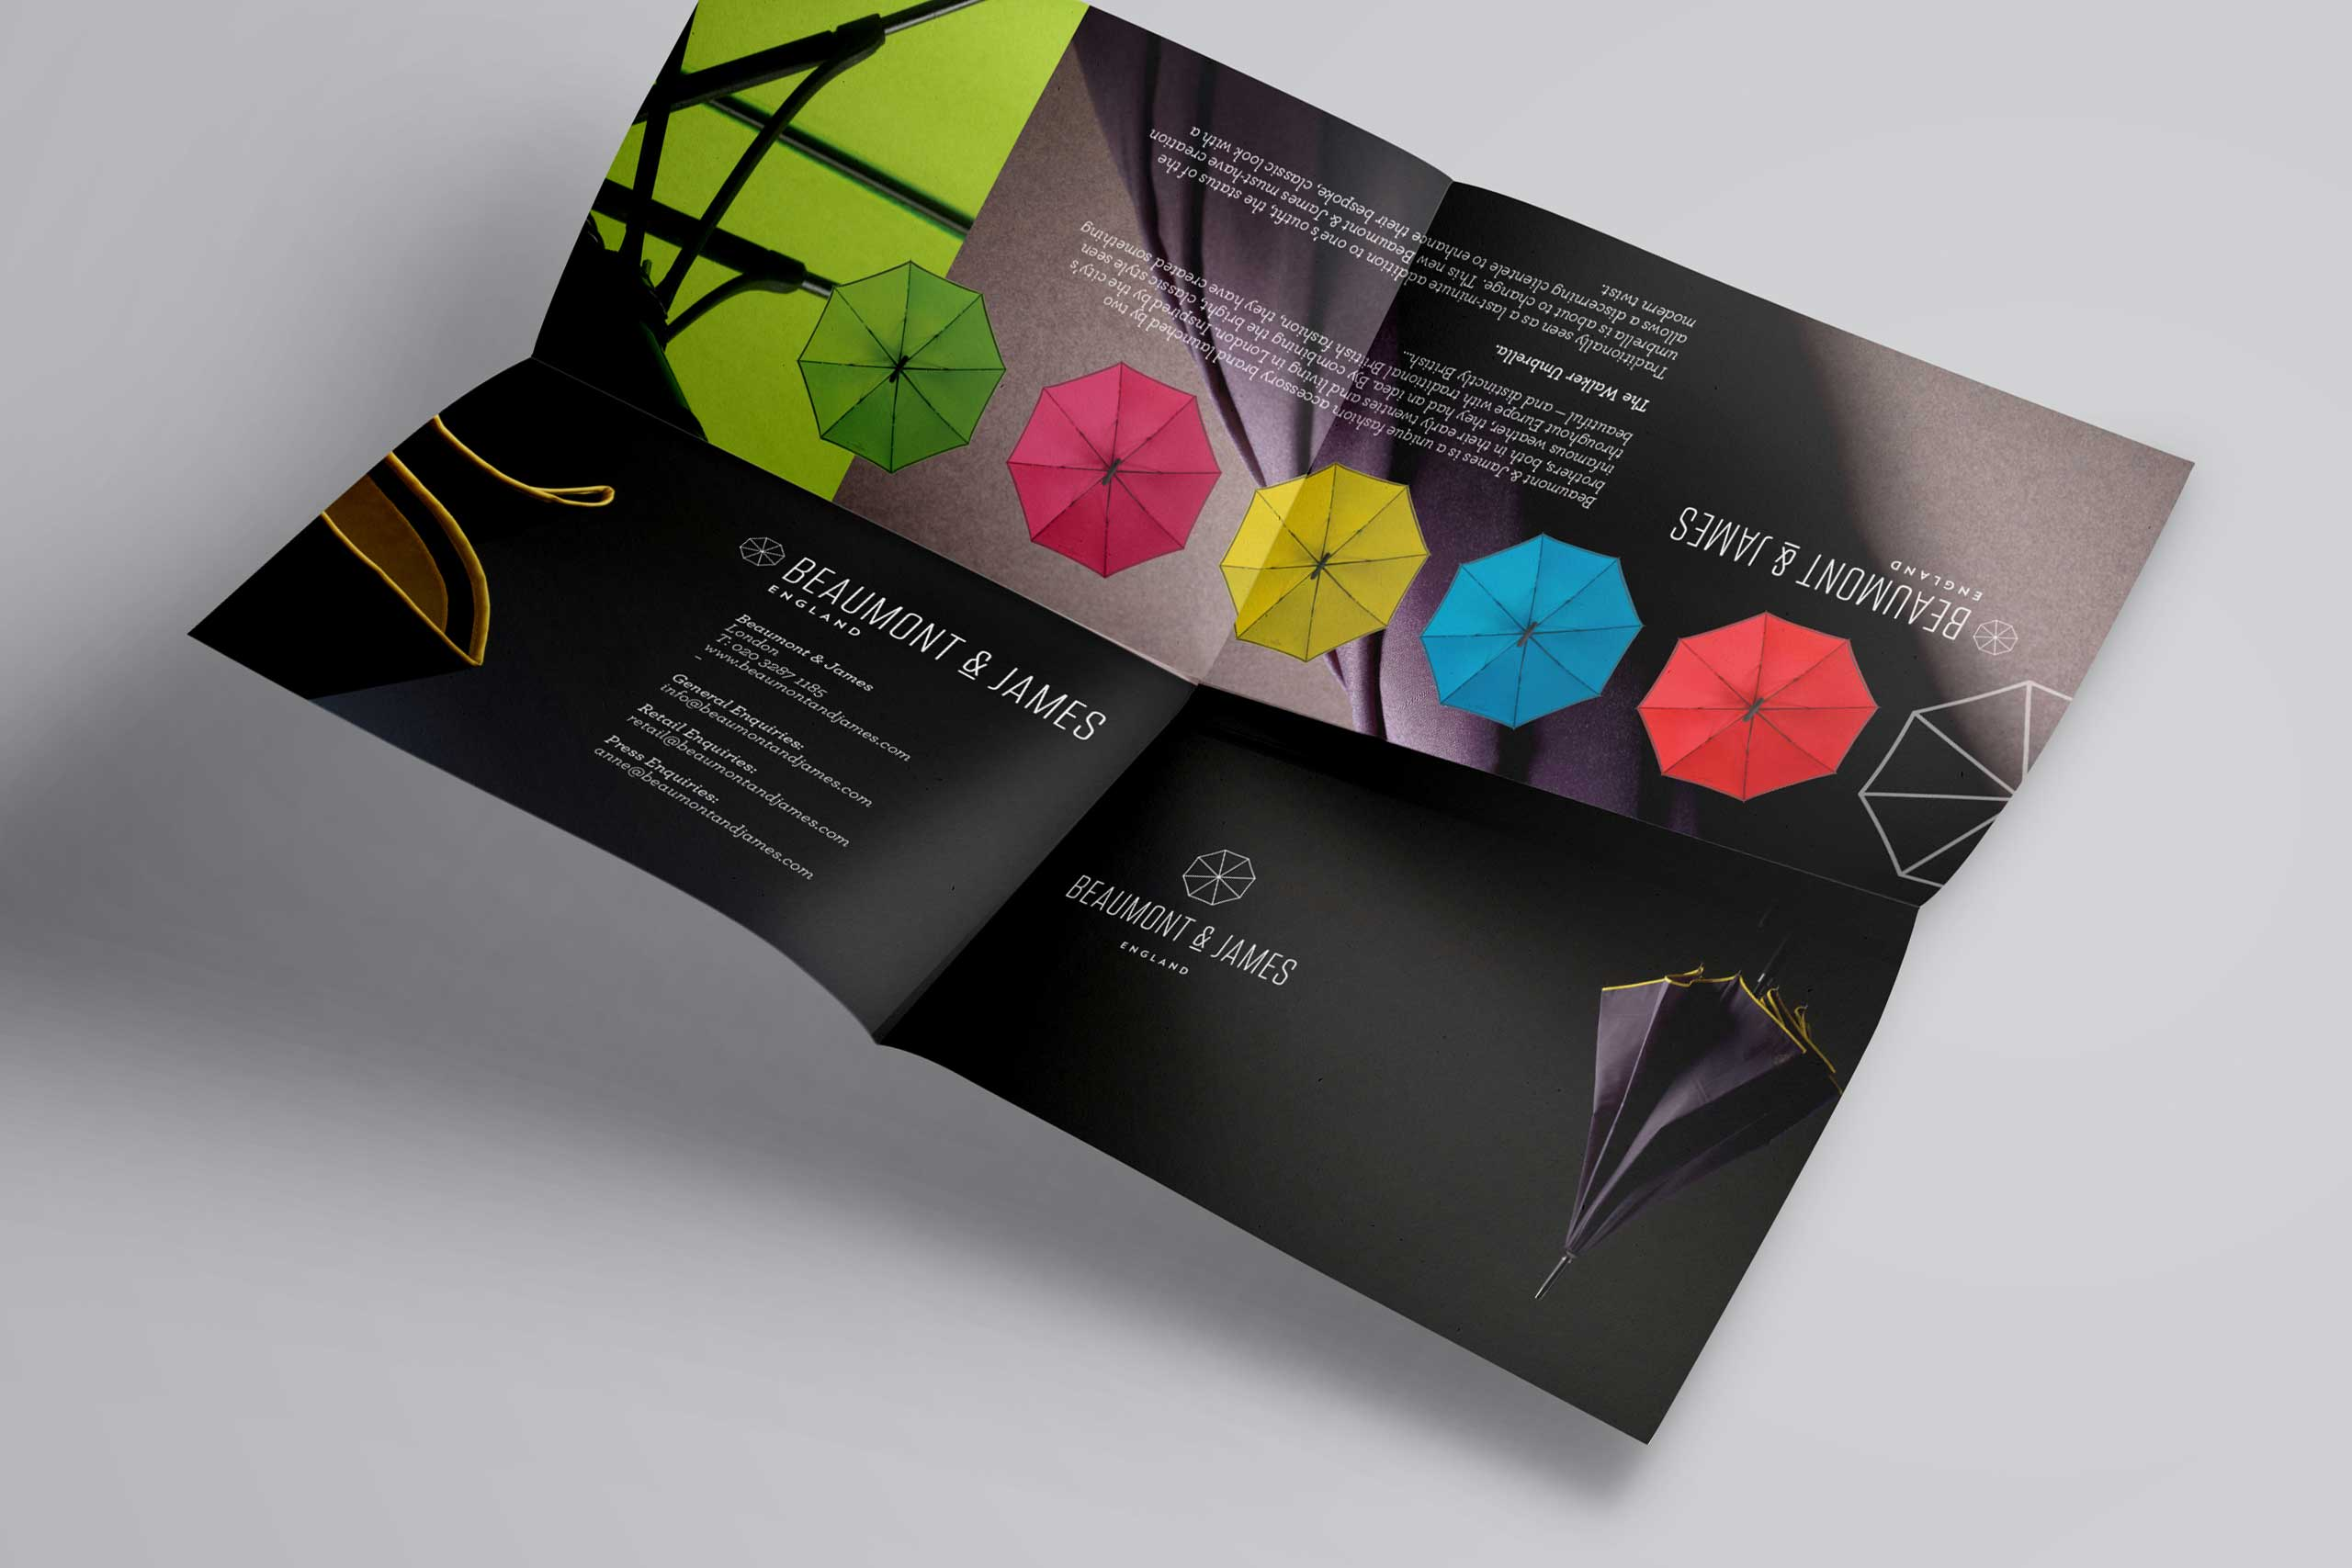 Flyer design for fashion brand